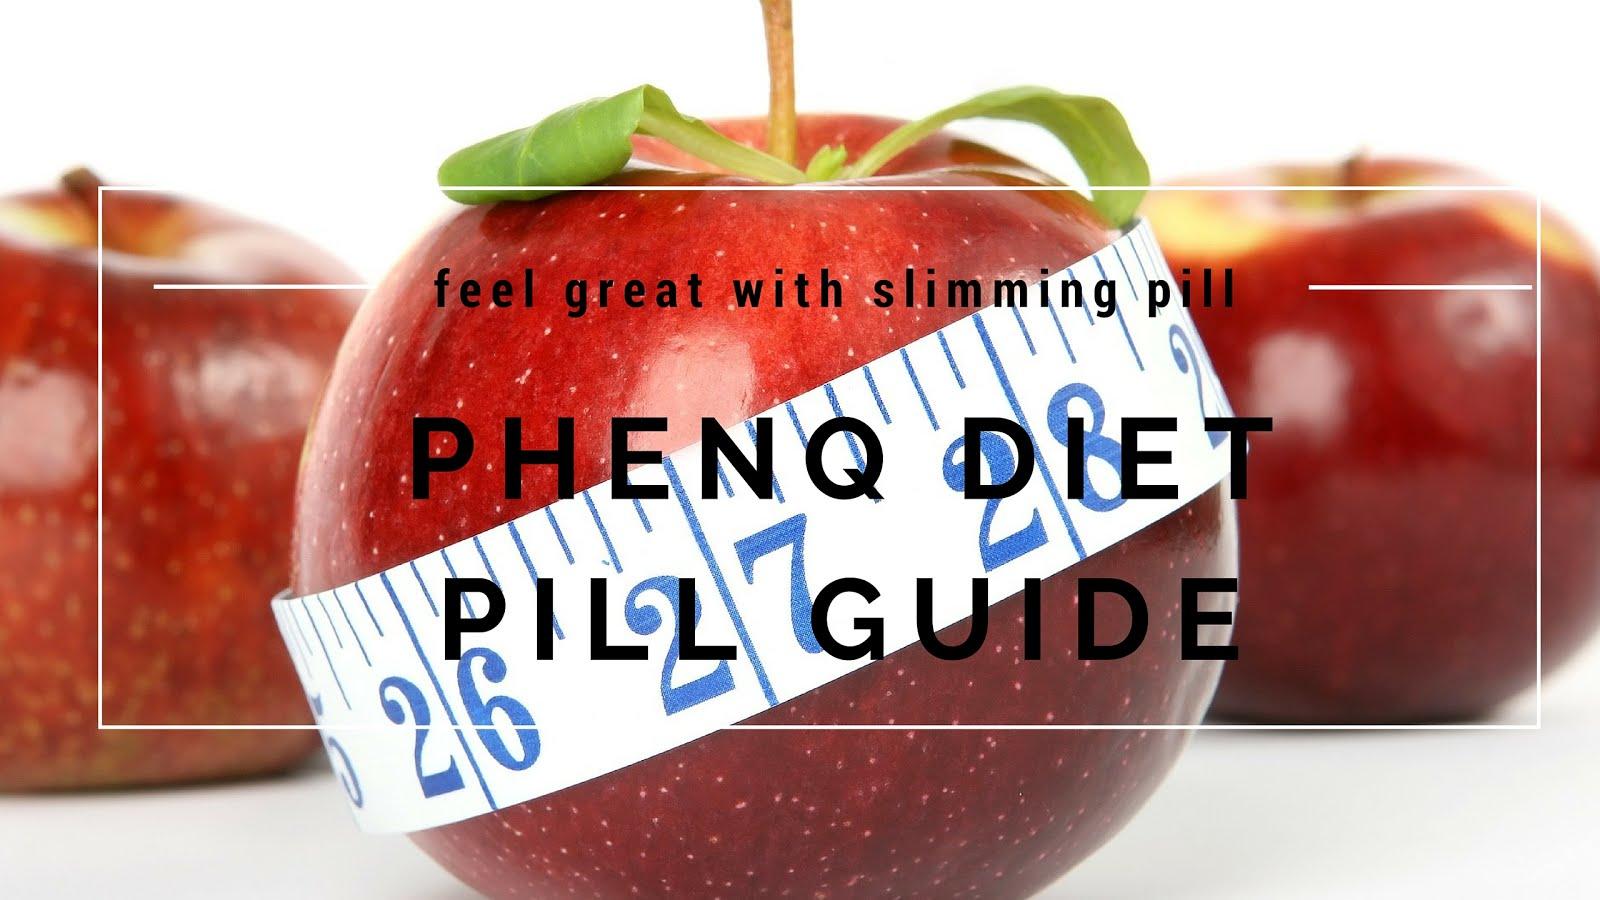 Phenq Diet Pills Guide